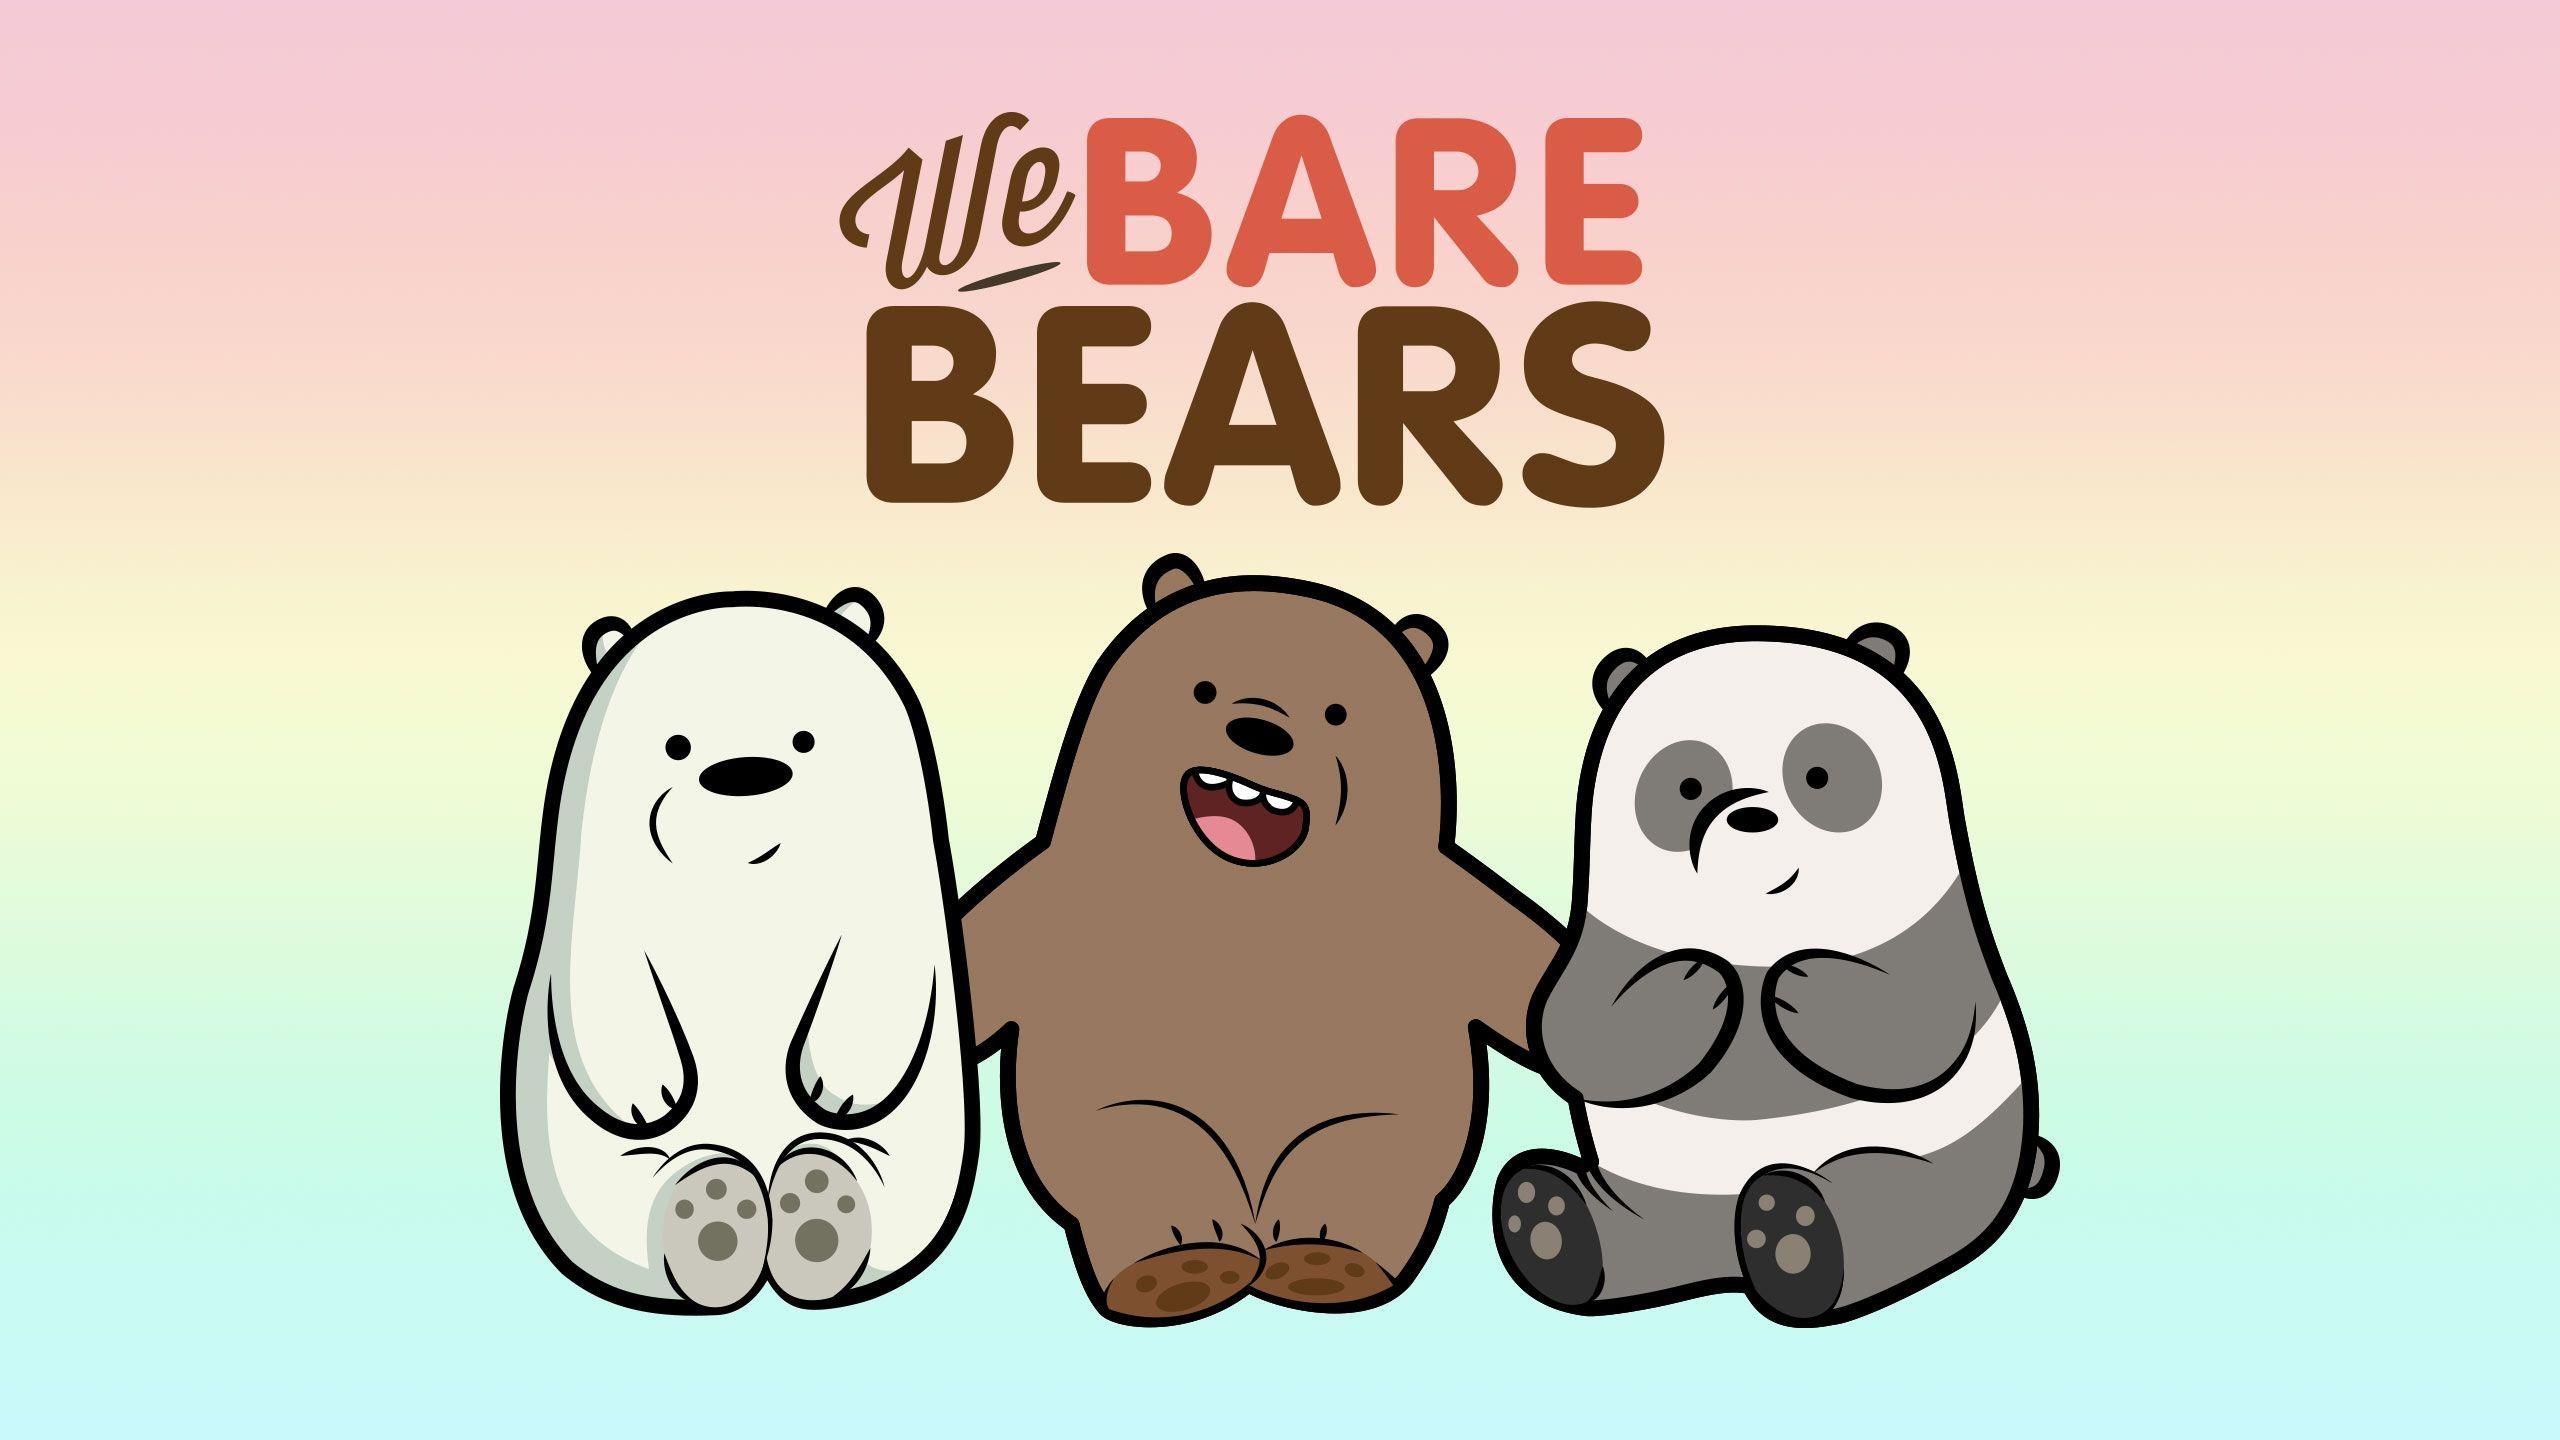 We Bare Bears Desktop Mobile Wallpapers Vector Ai Eps Intended For Amazing We Bare Bears Wallpaper Laptop Hd Kartun Tulisan